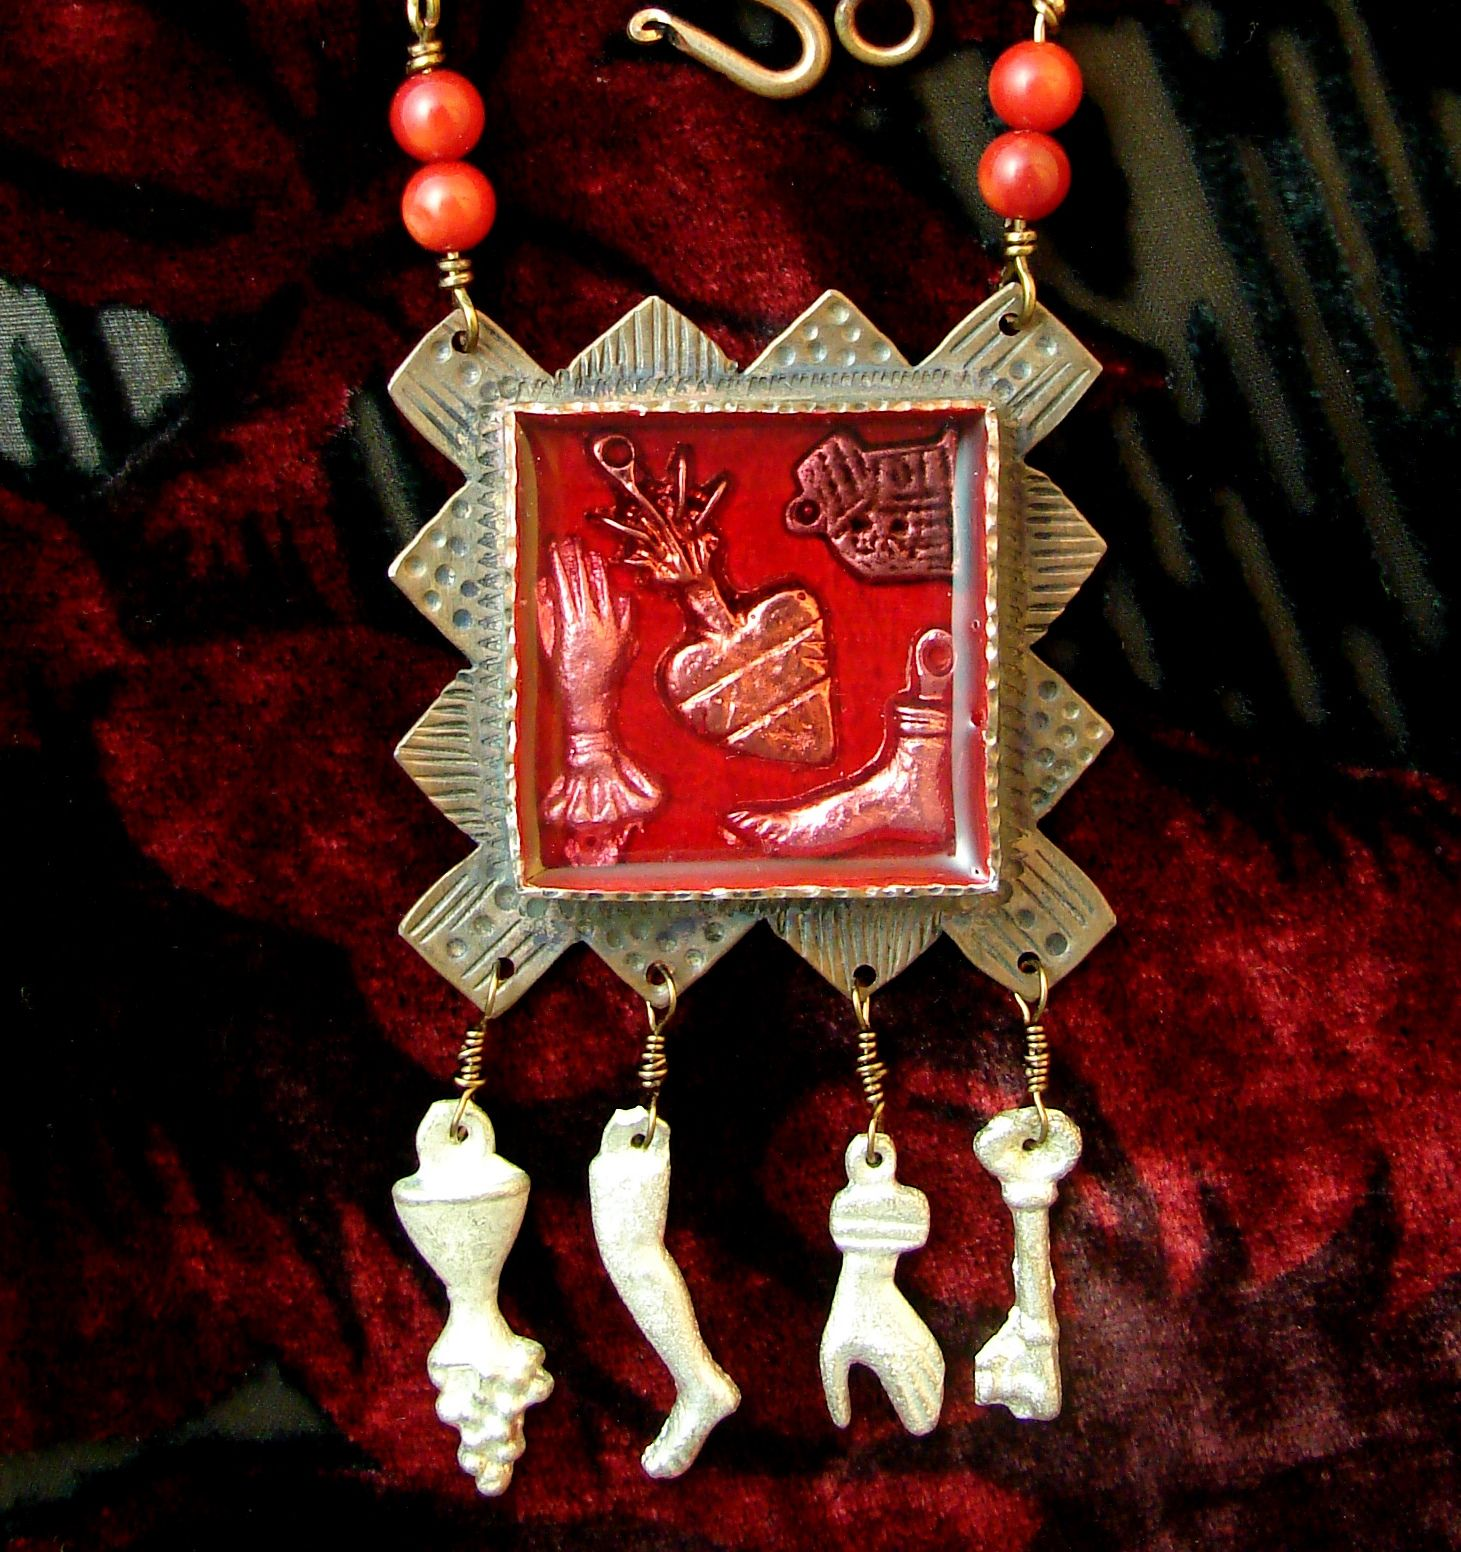 Handcrafted Jewelry Nicho by Lorena Angulo